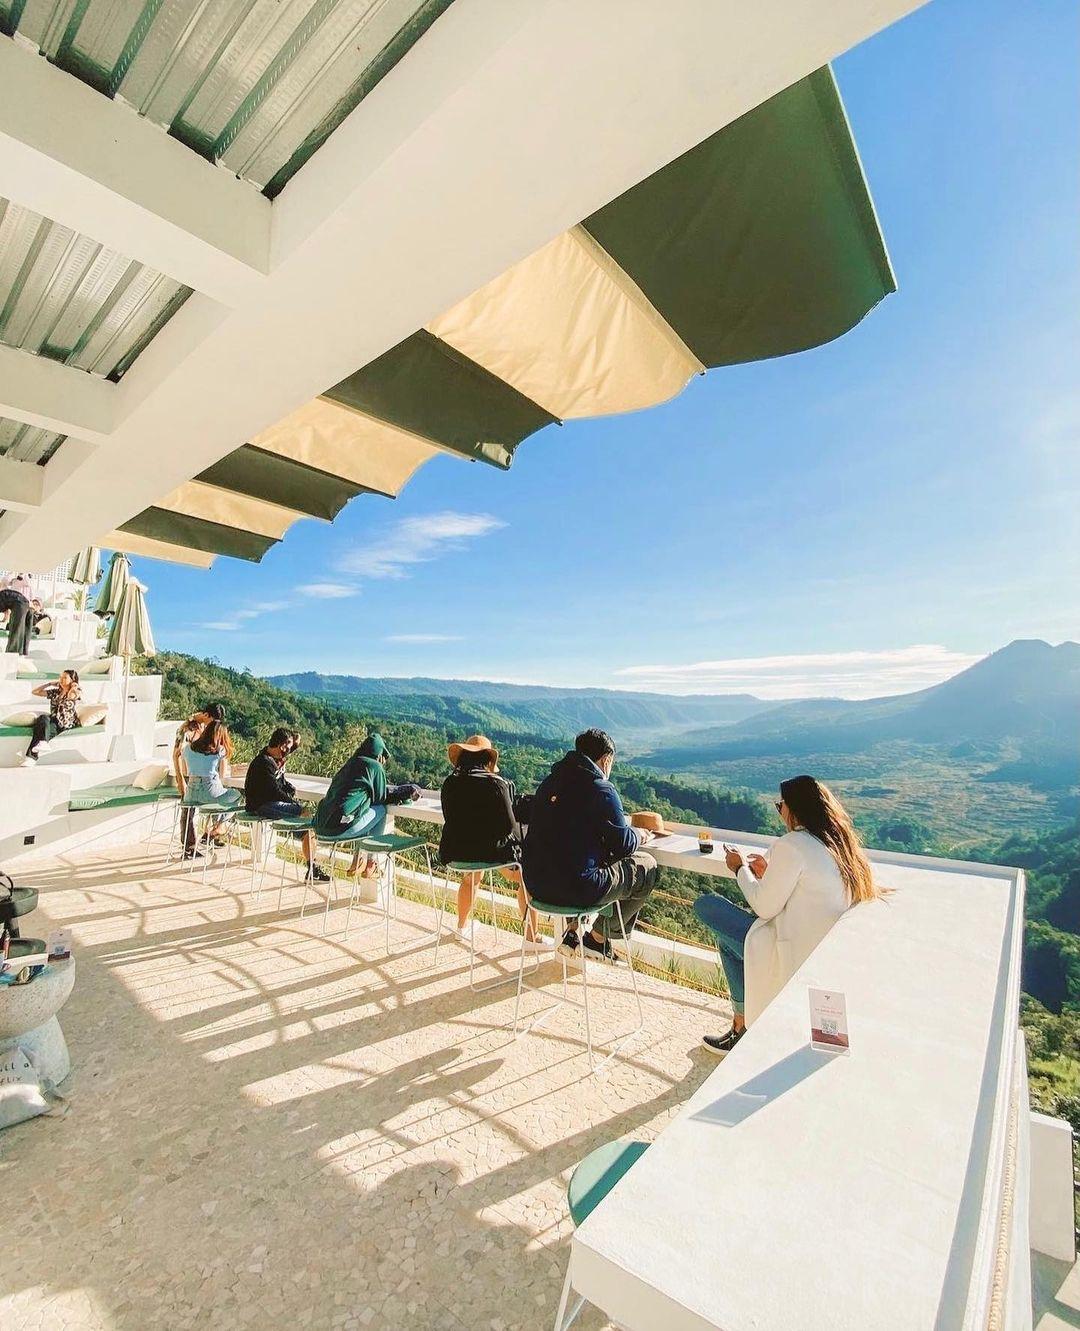 Cafe Di Kintamani View Gunung